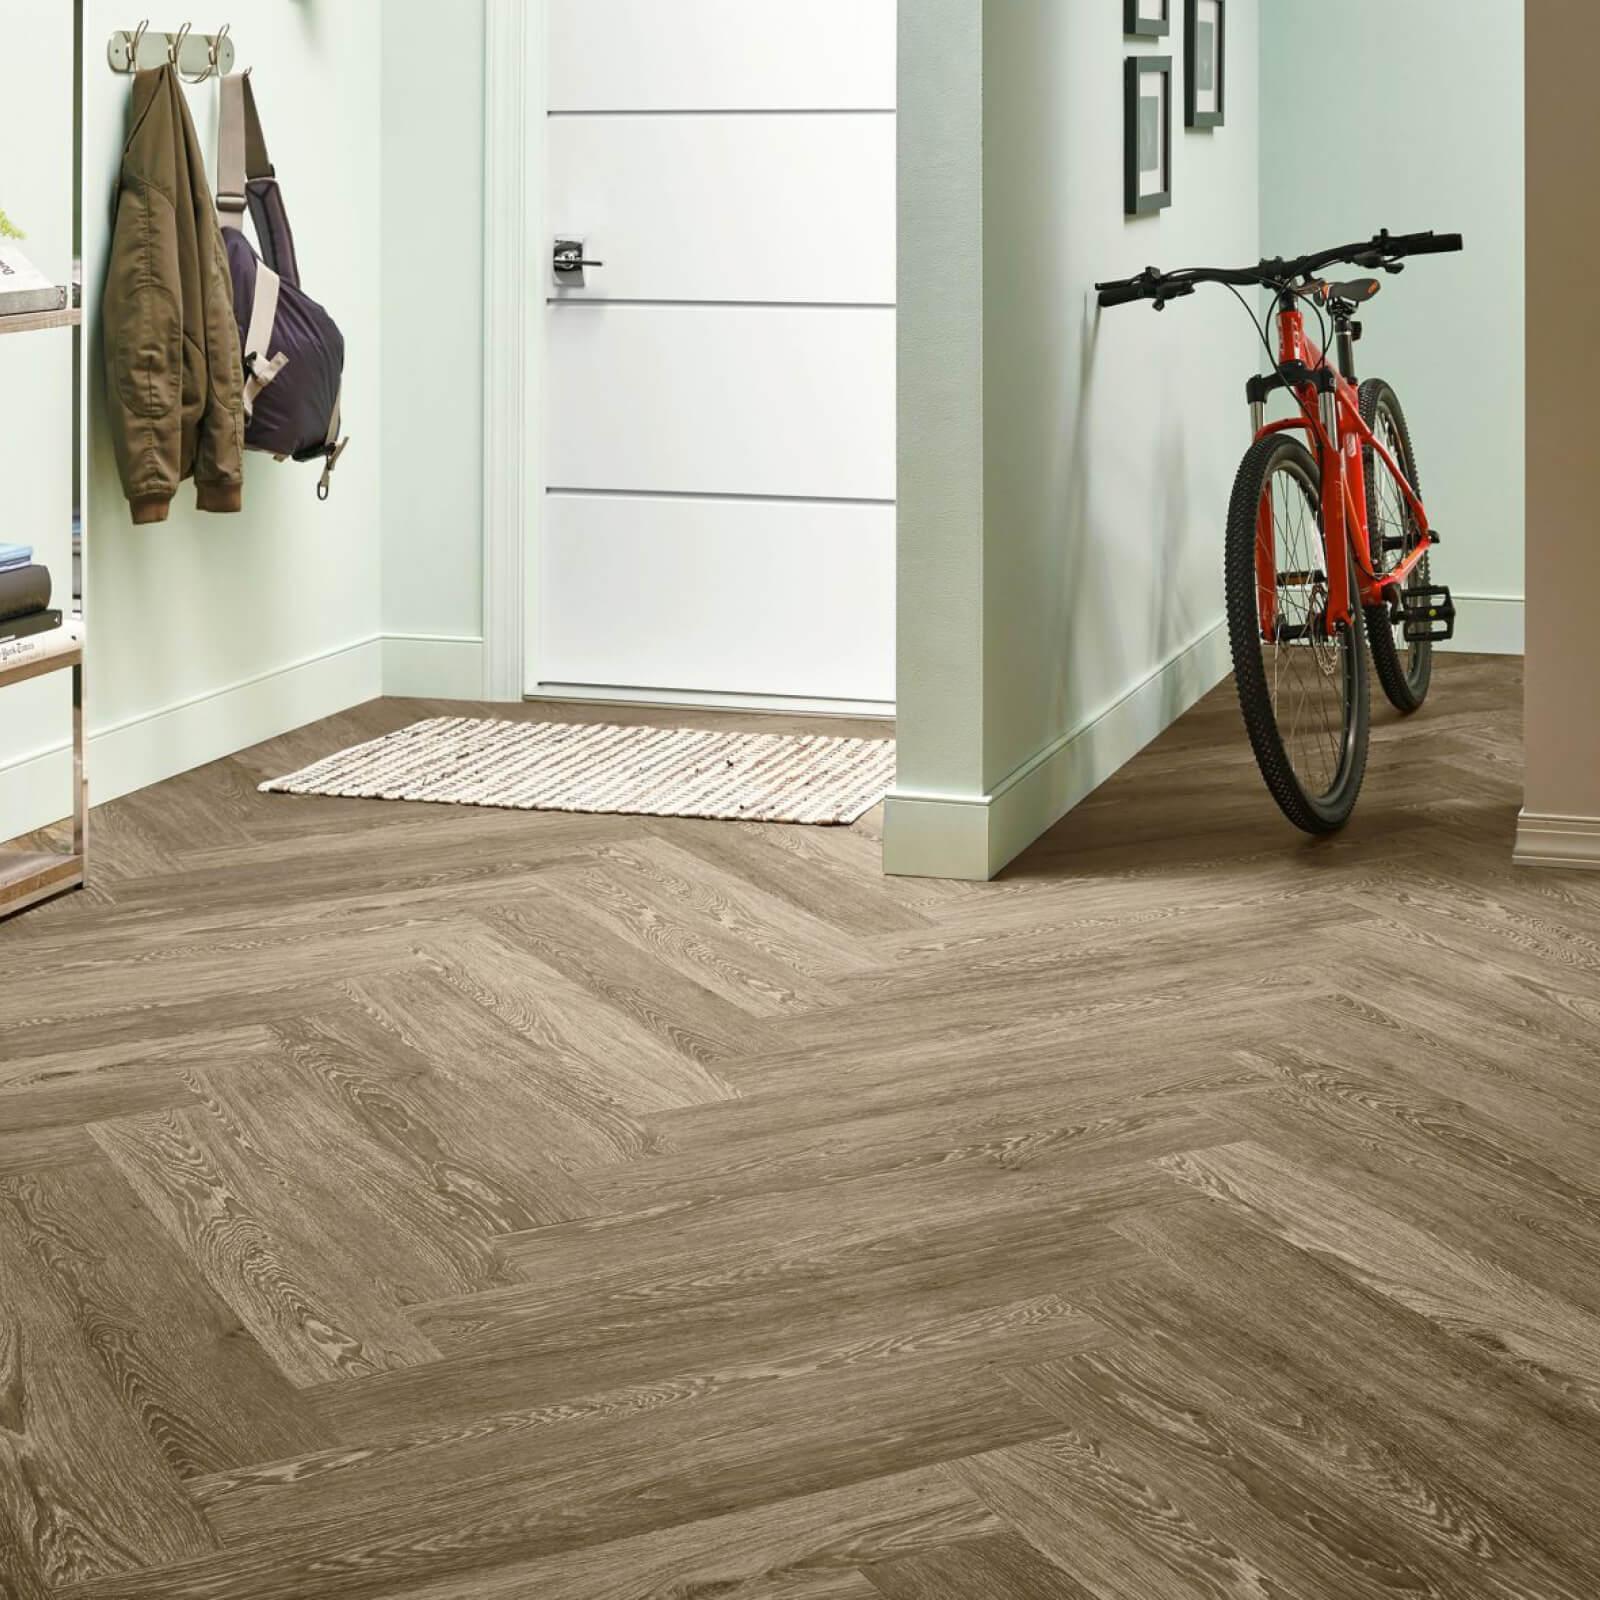 Bicycle on flooring | Bassett Carpets